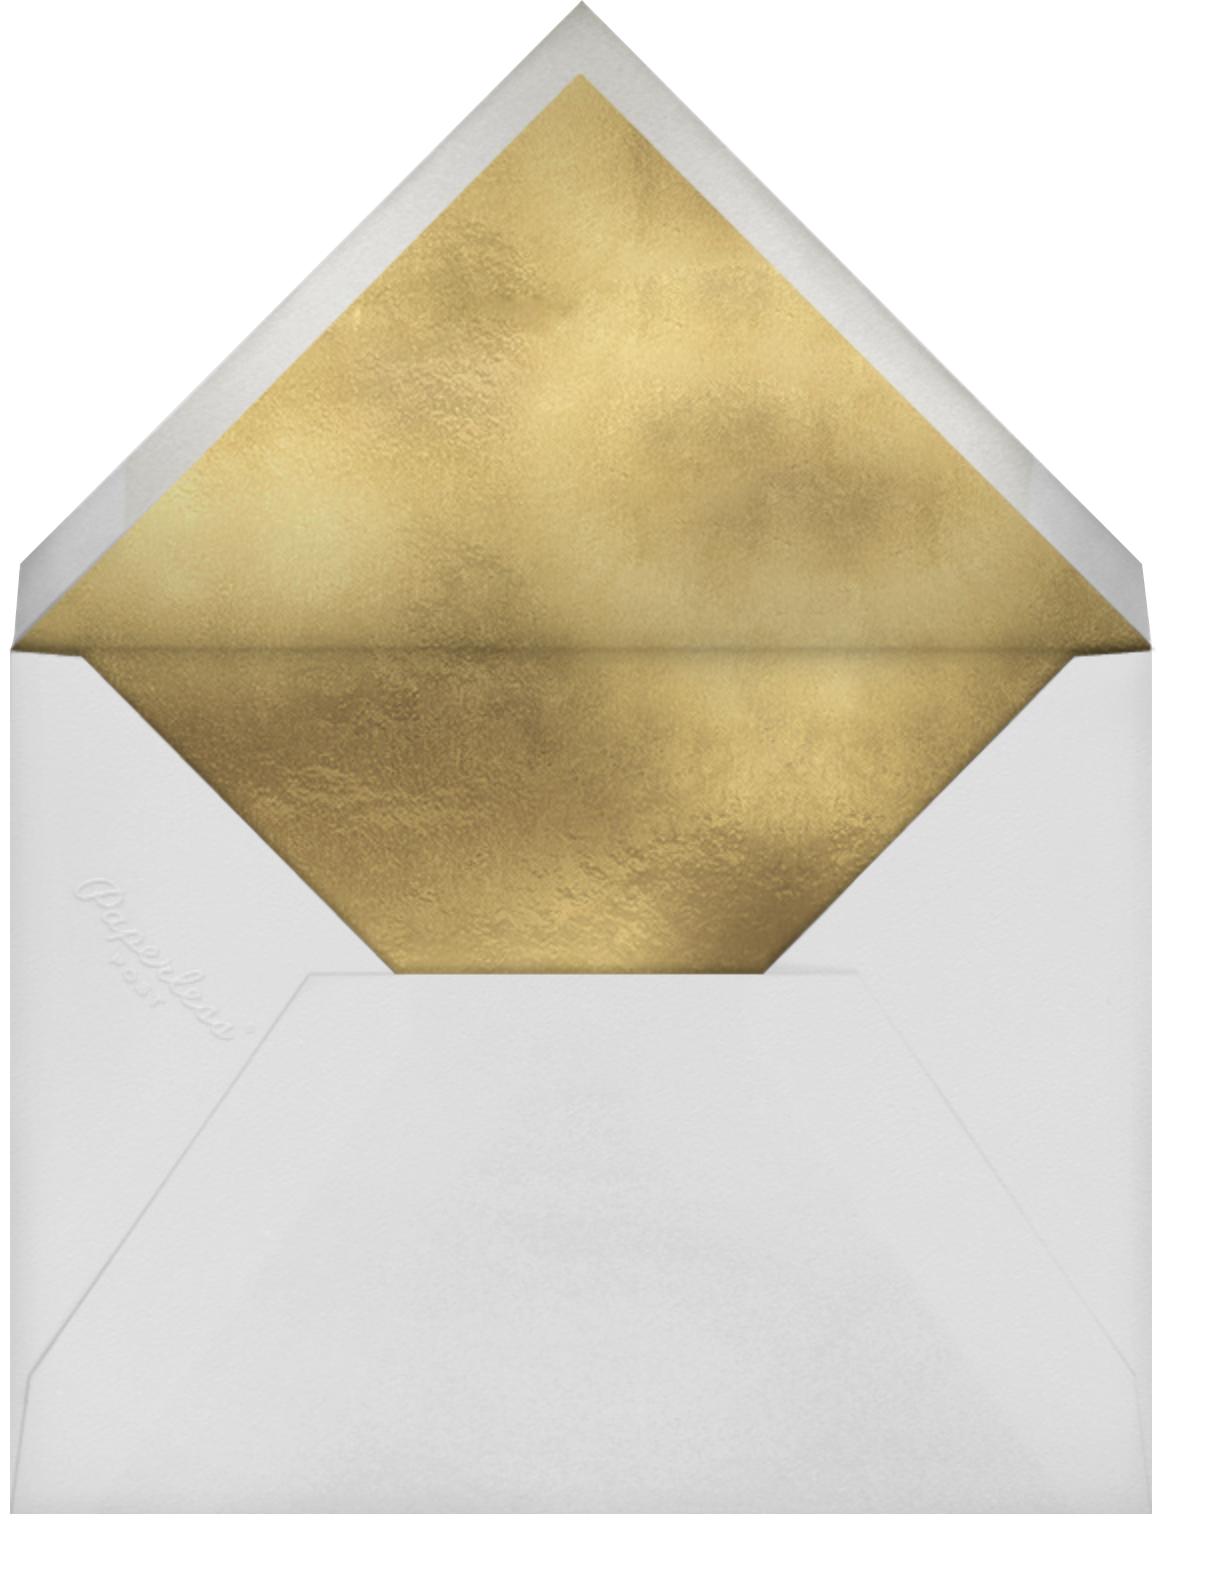 Ethereal Wash - Ashley G - Quinceañera - envelope back